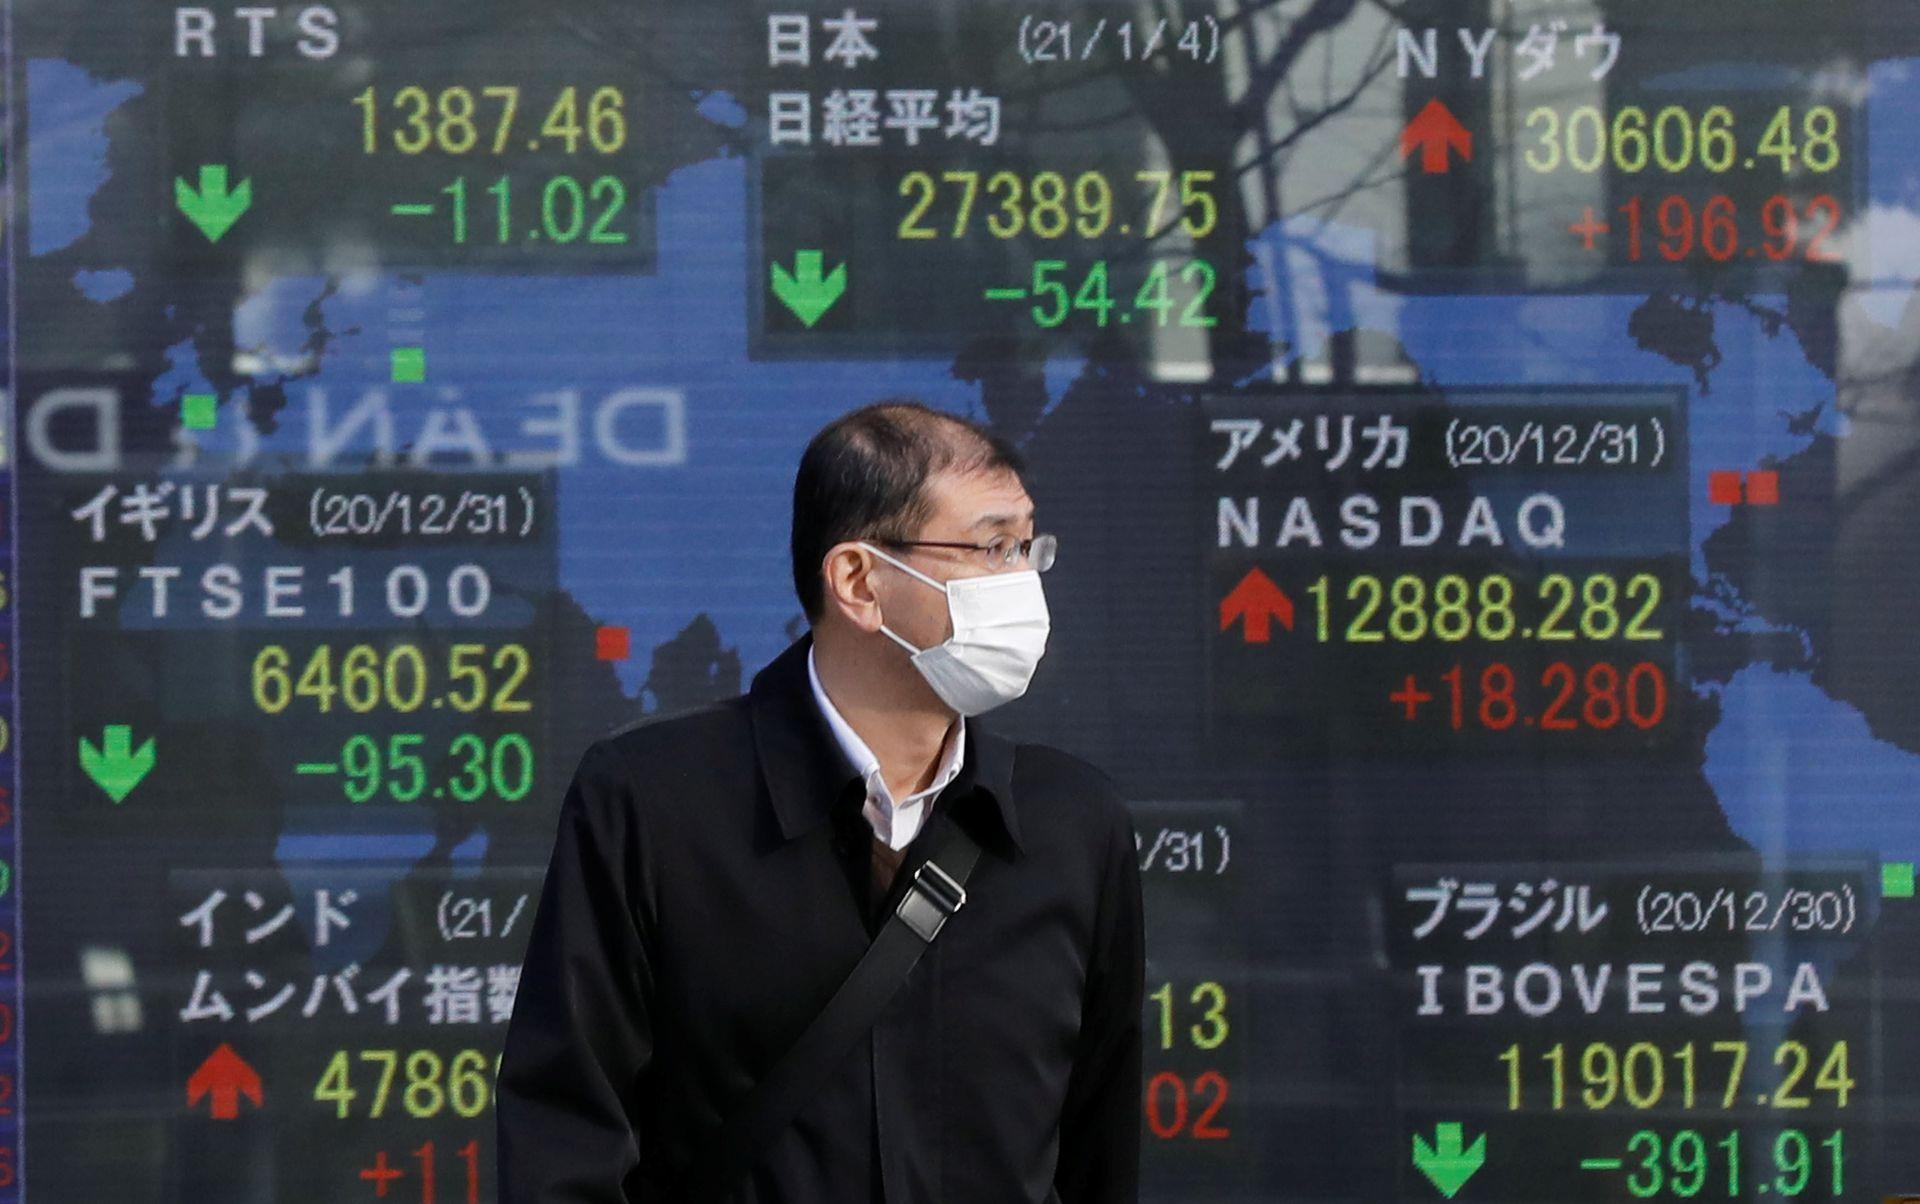 Asian equities inspire confidence despite recent volatility